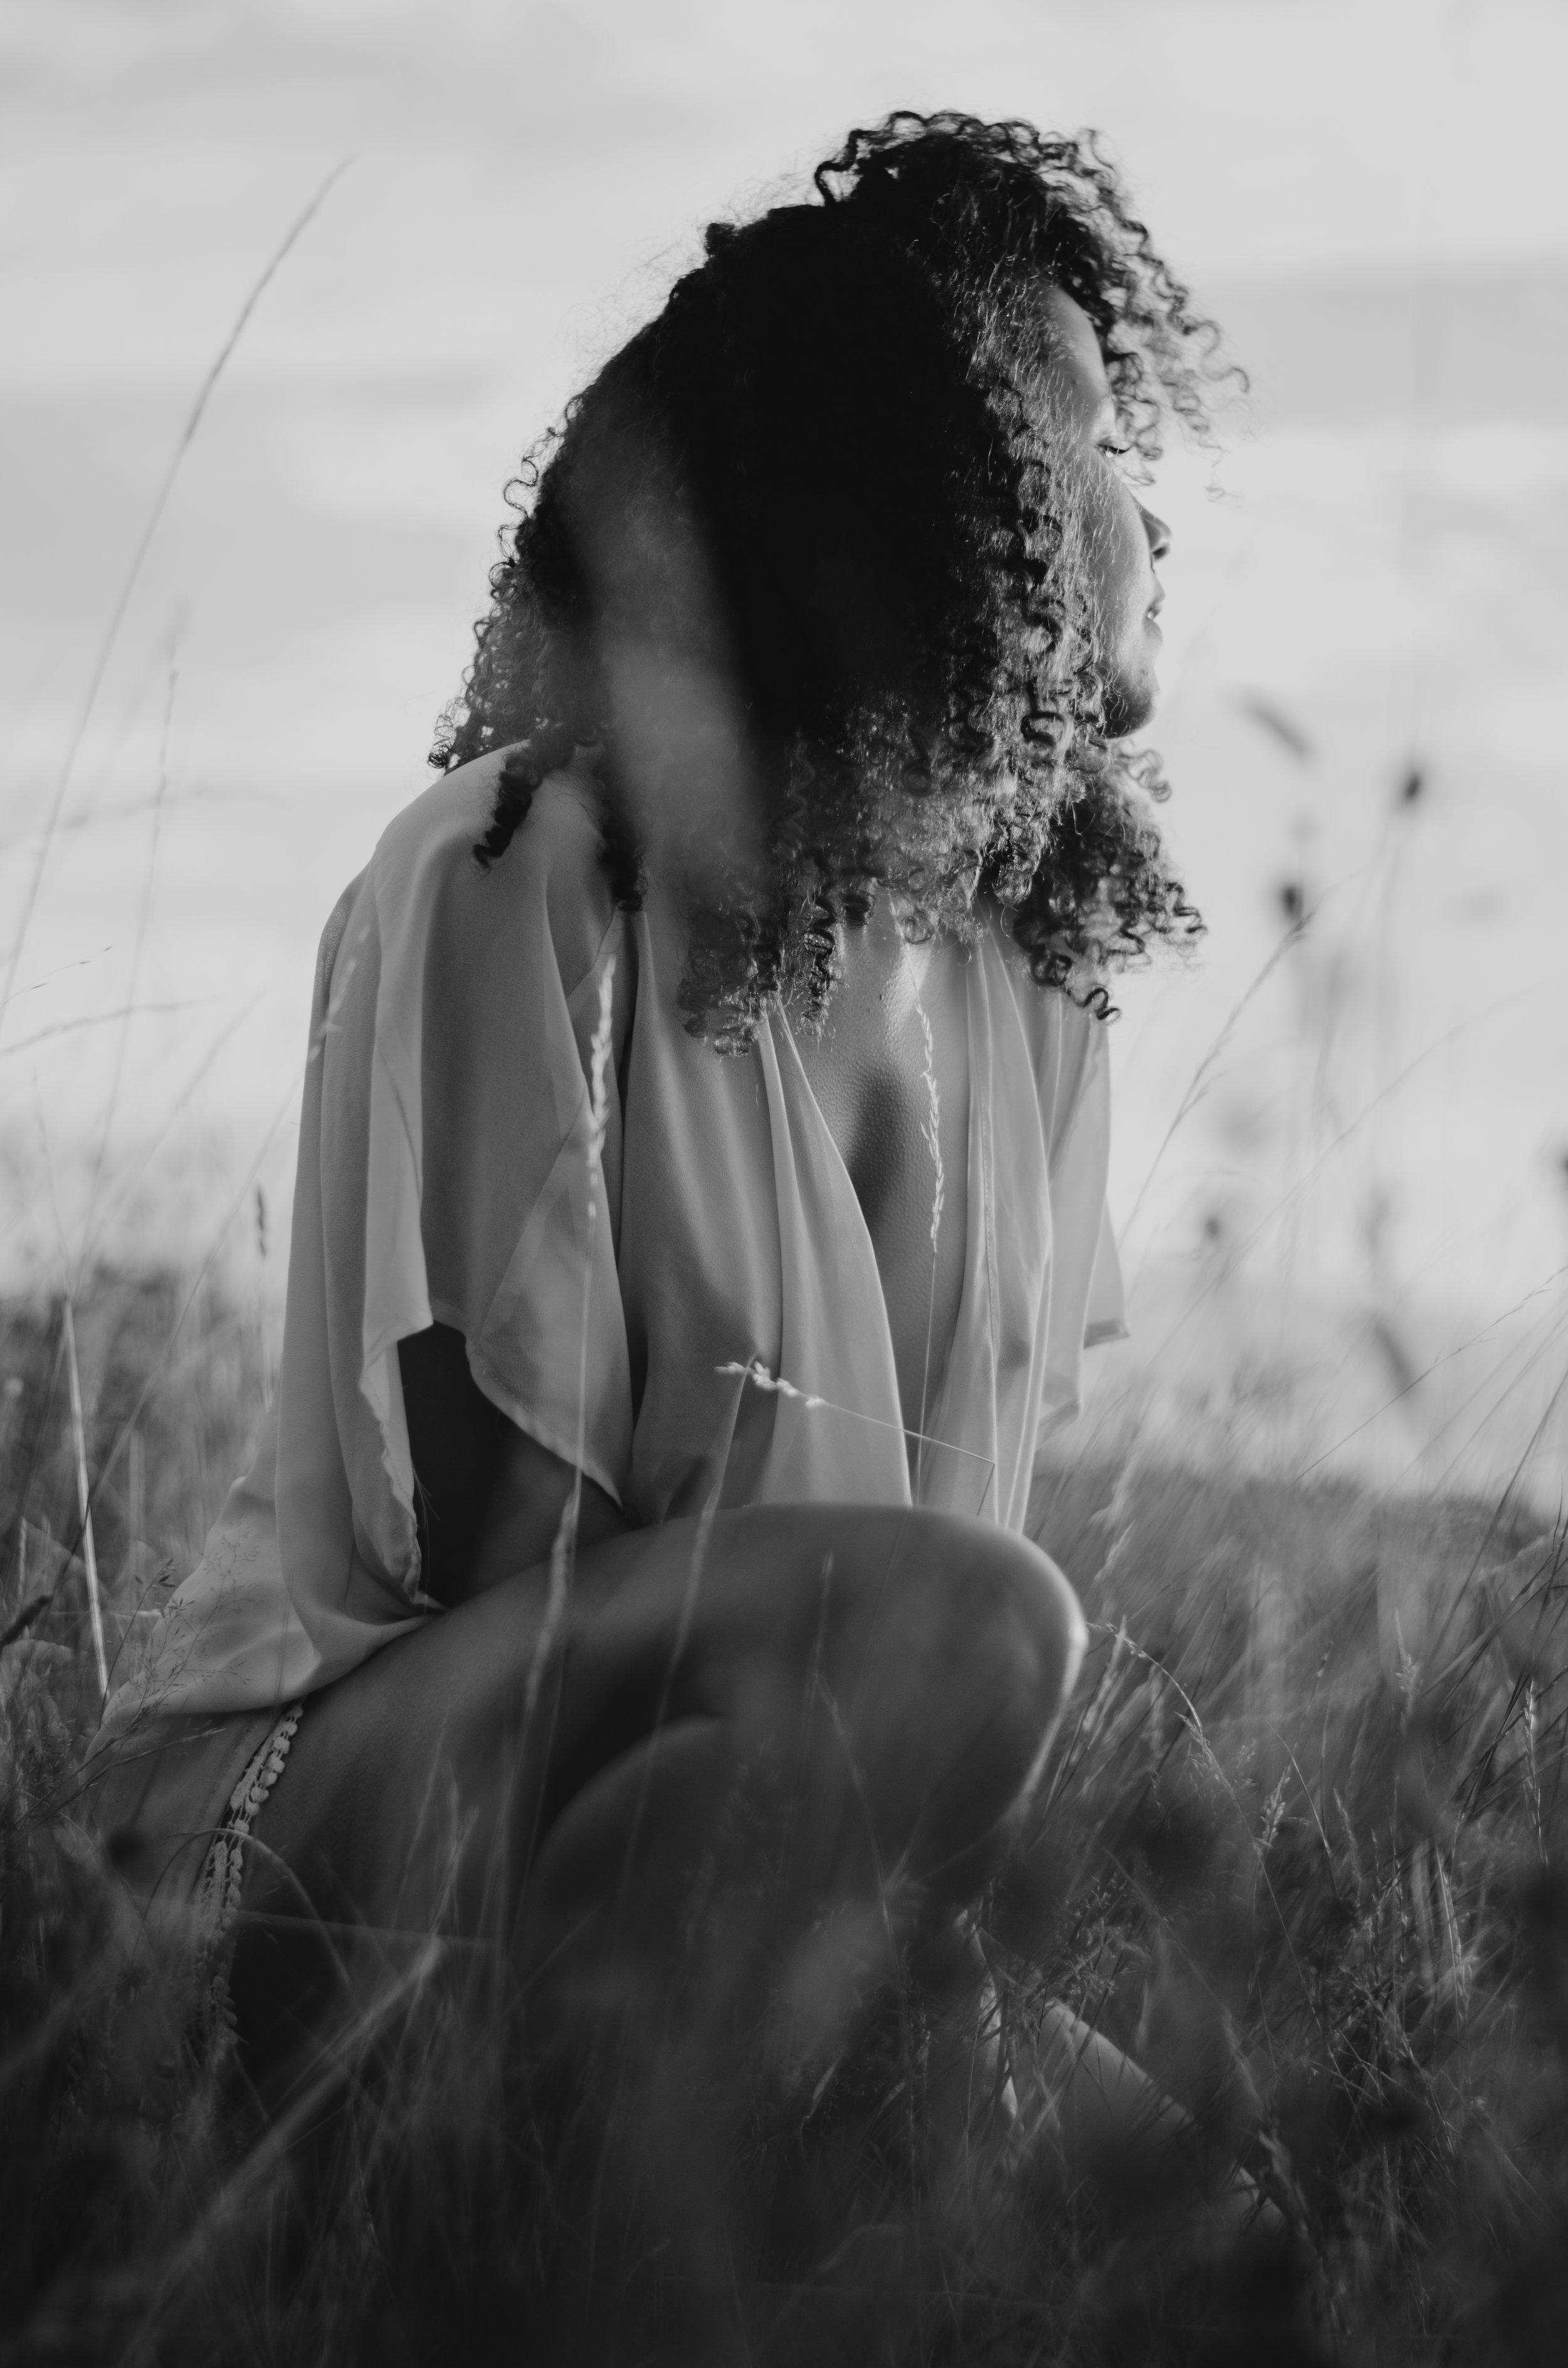 Inka-Portrait-Session-Aiste-Saulyte-Photography-17-07-30-350.jpg